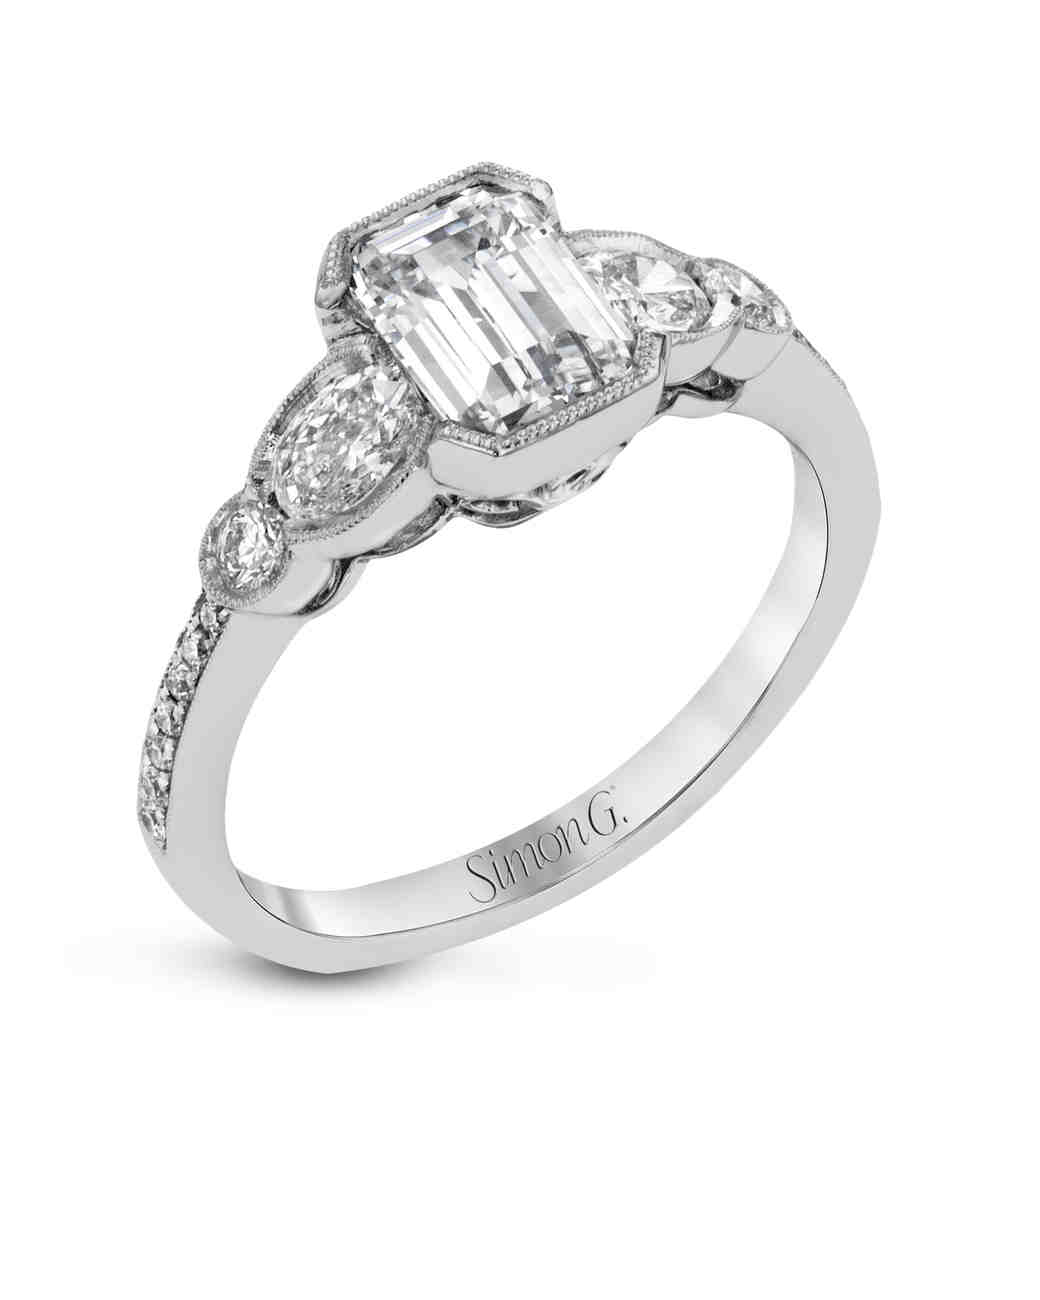 Simon G. Emerald-Cut Engagement Ring